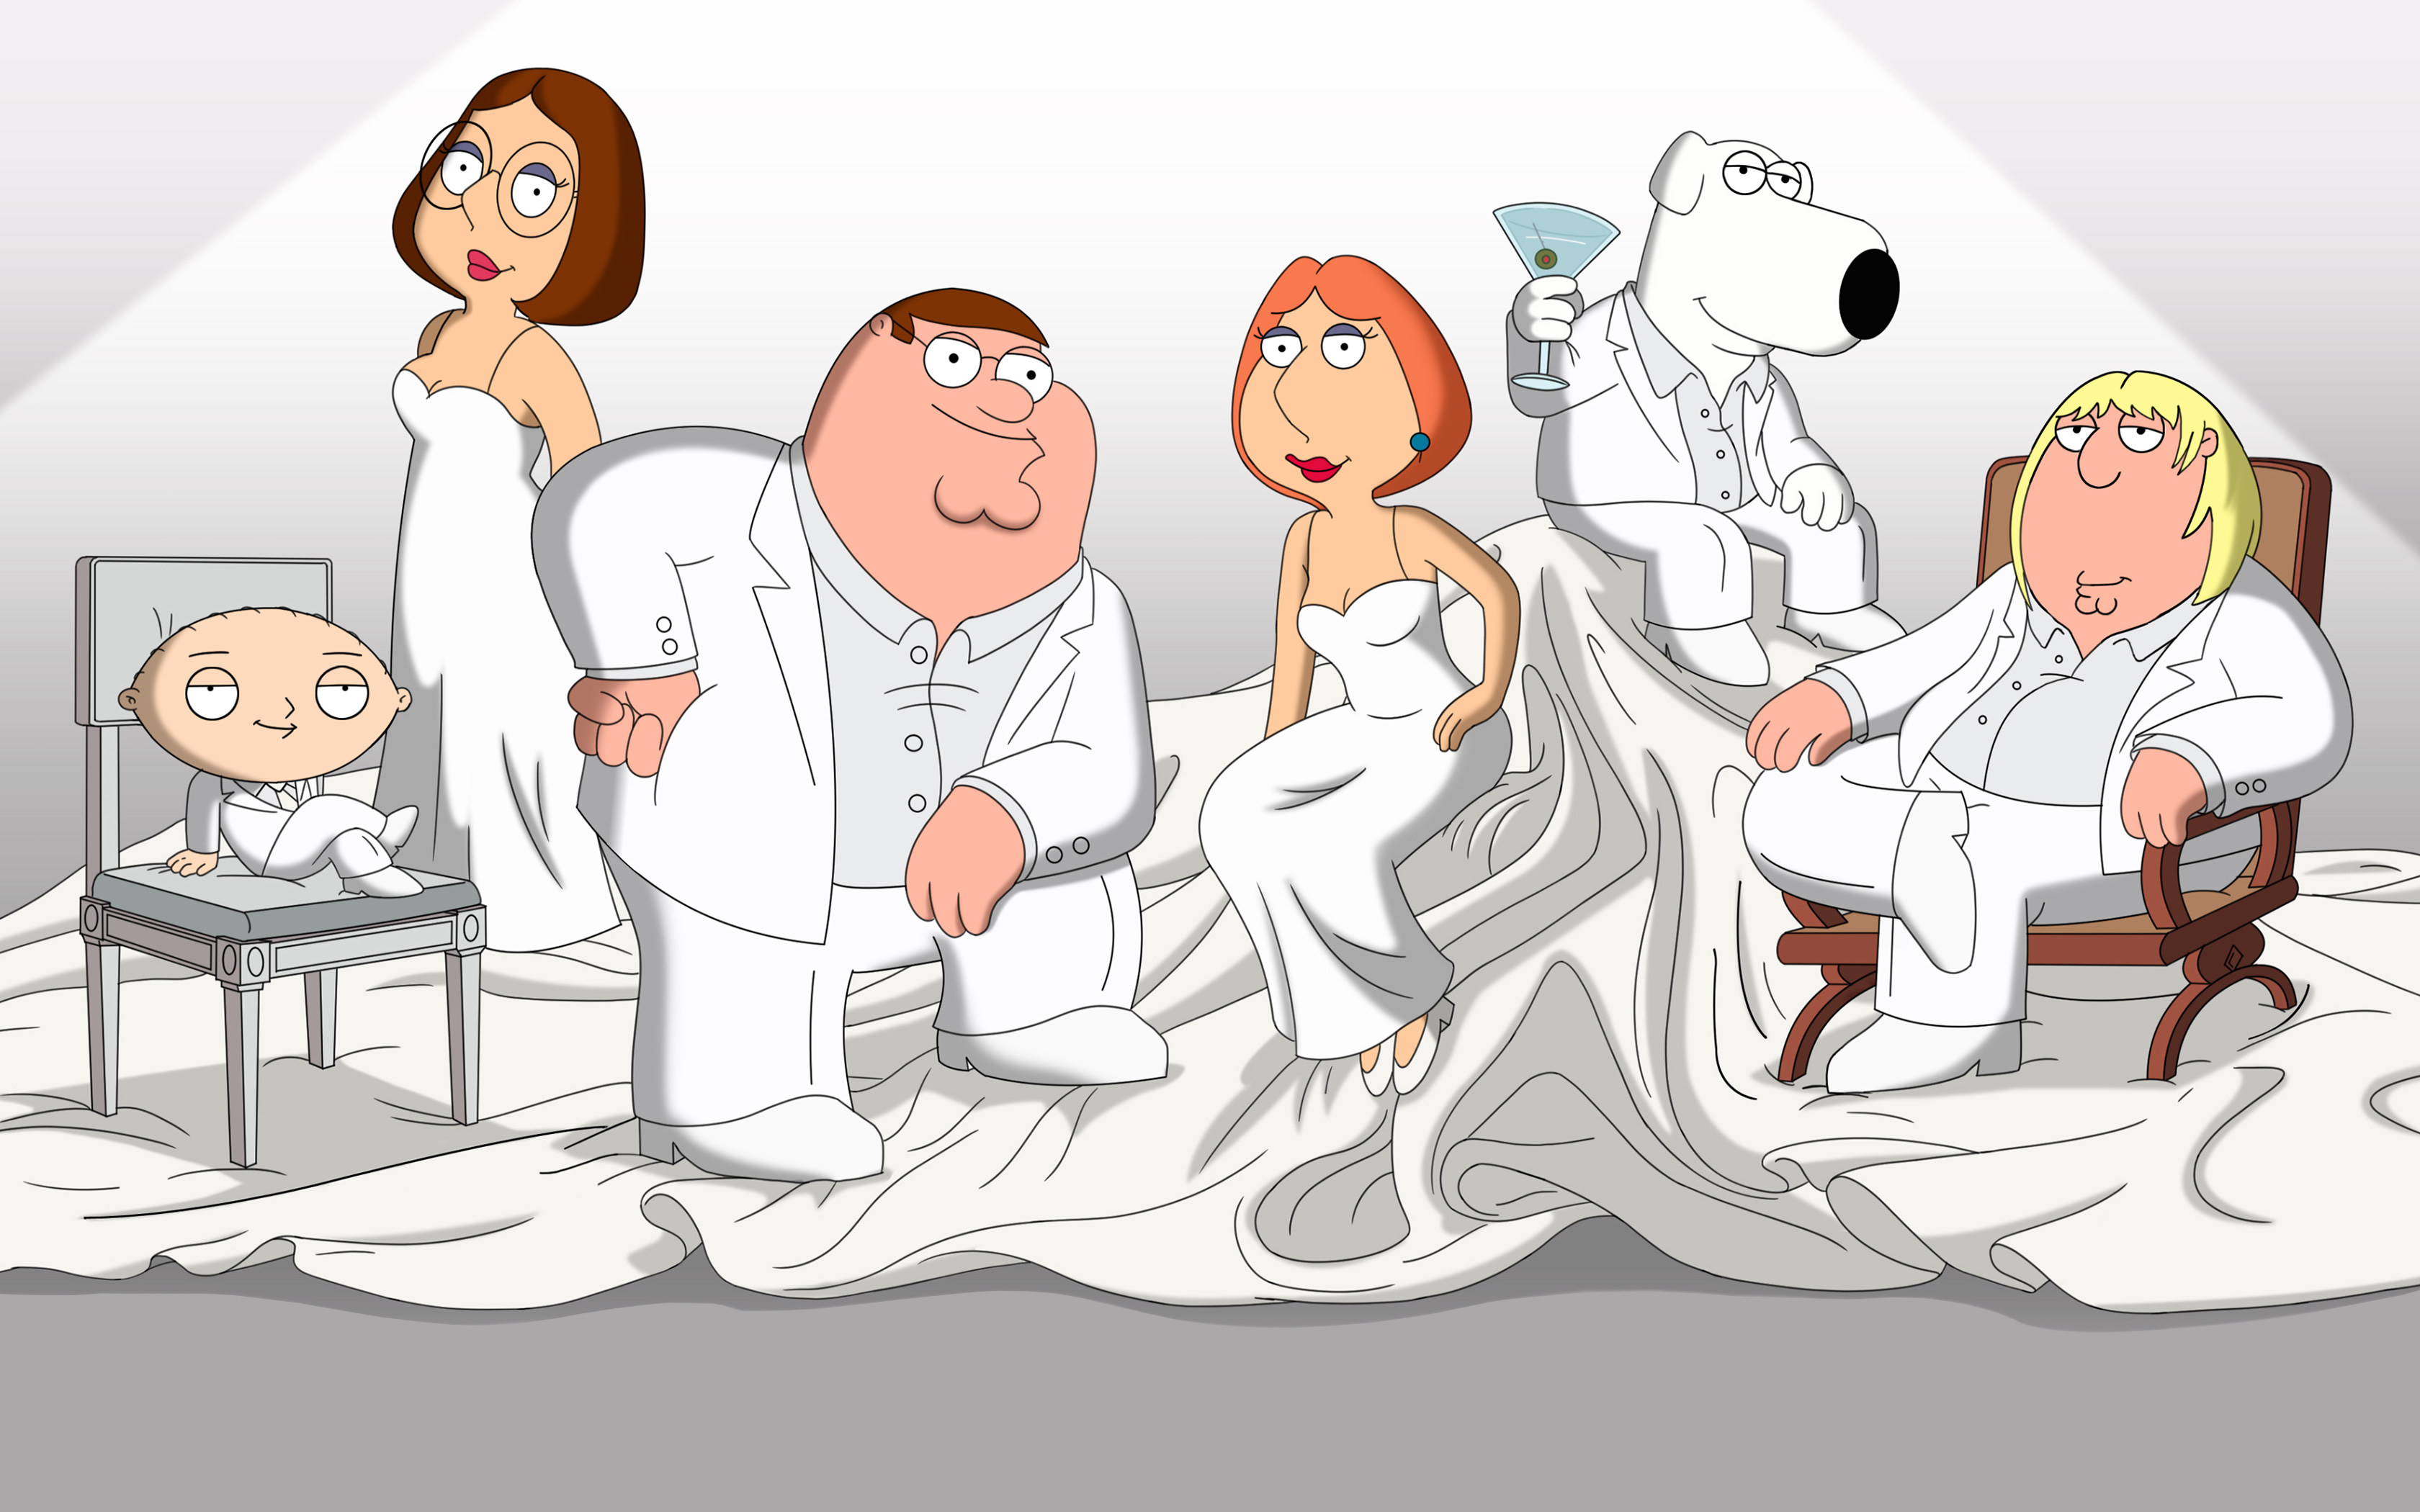 1125x2436 Family Guy Iphone Xs Iphone 10 Iphone X Hd 4k